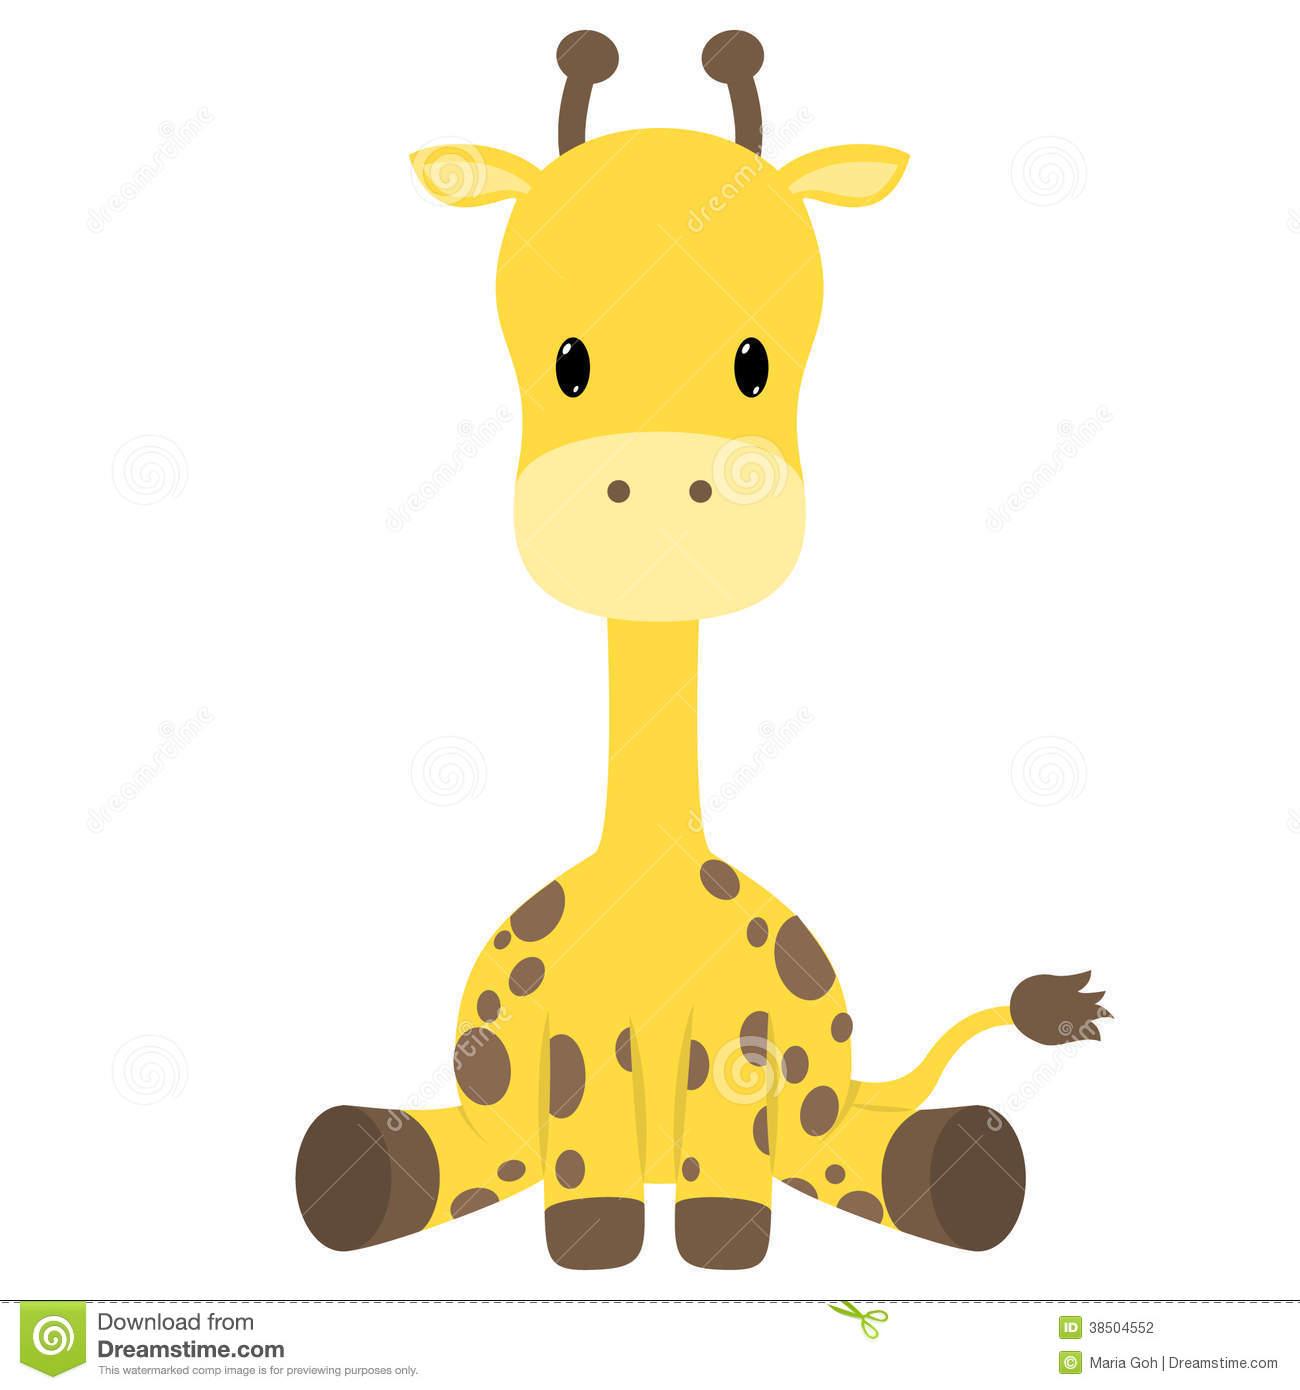 Baby Giraffe Free Clipart-Baby Giraffe Free Clipart-6